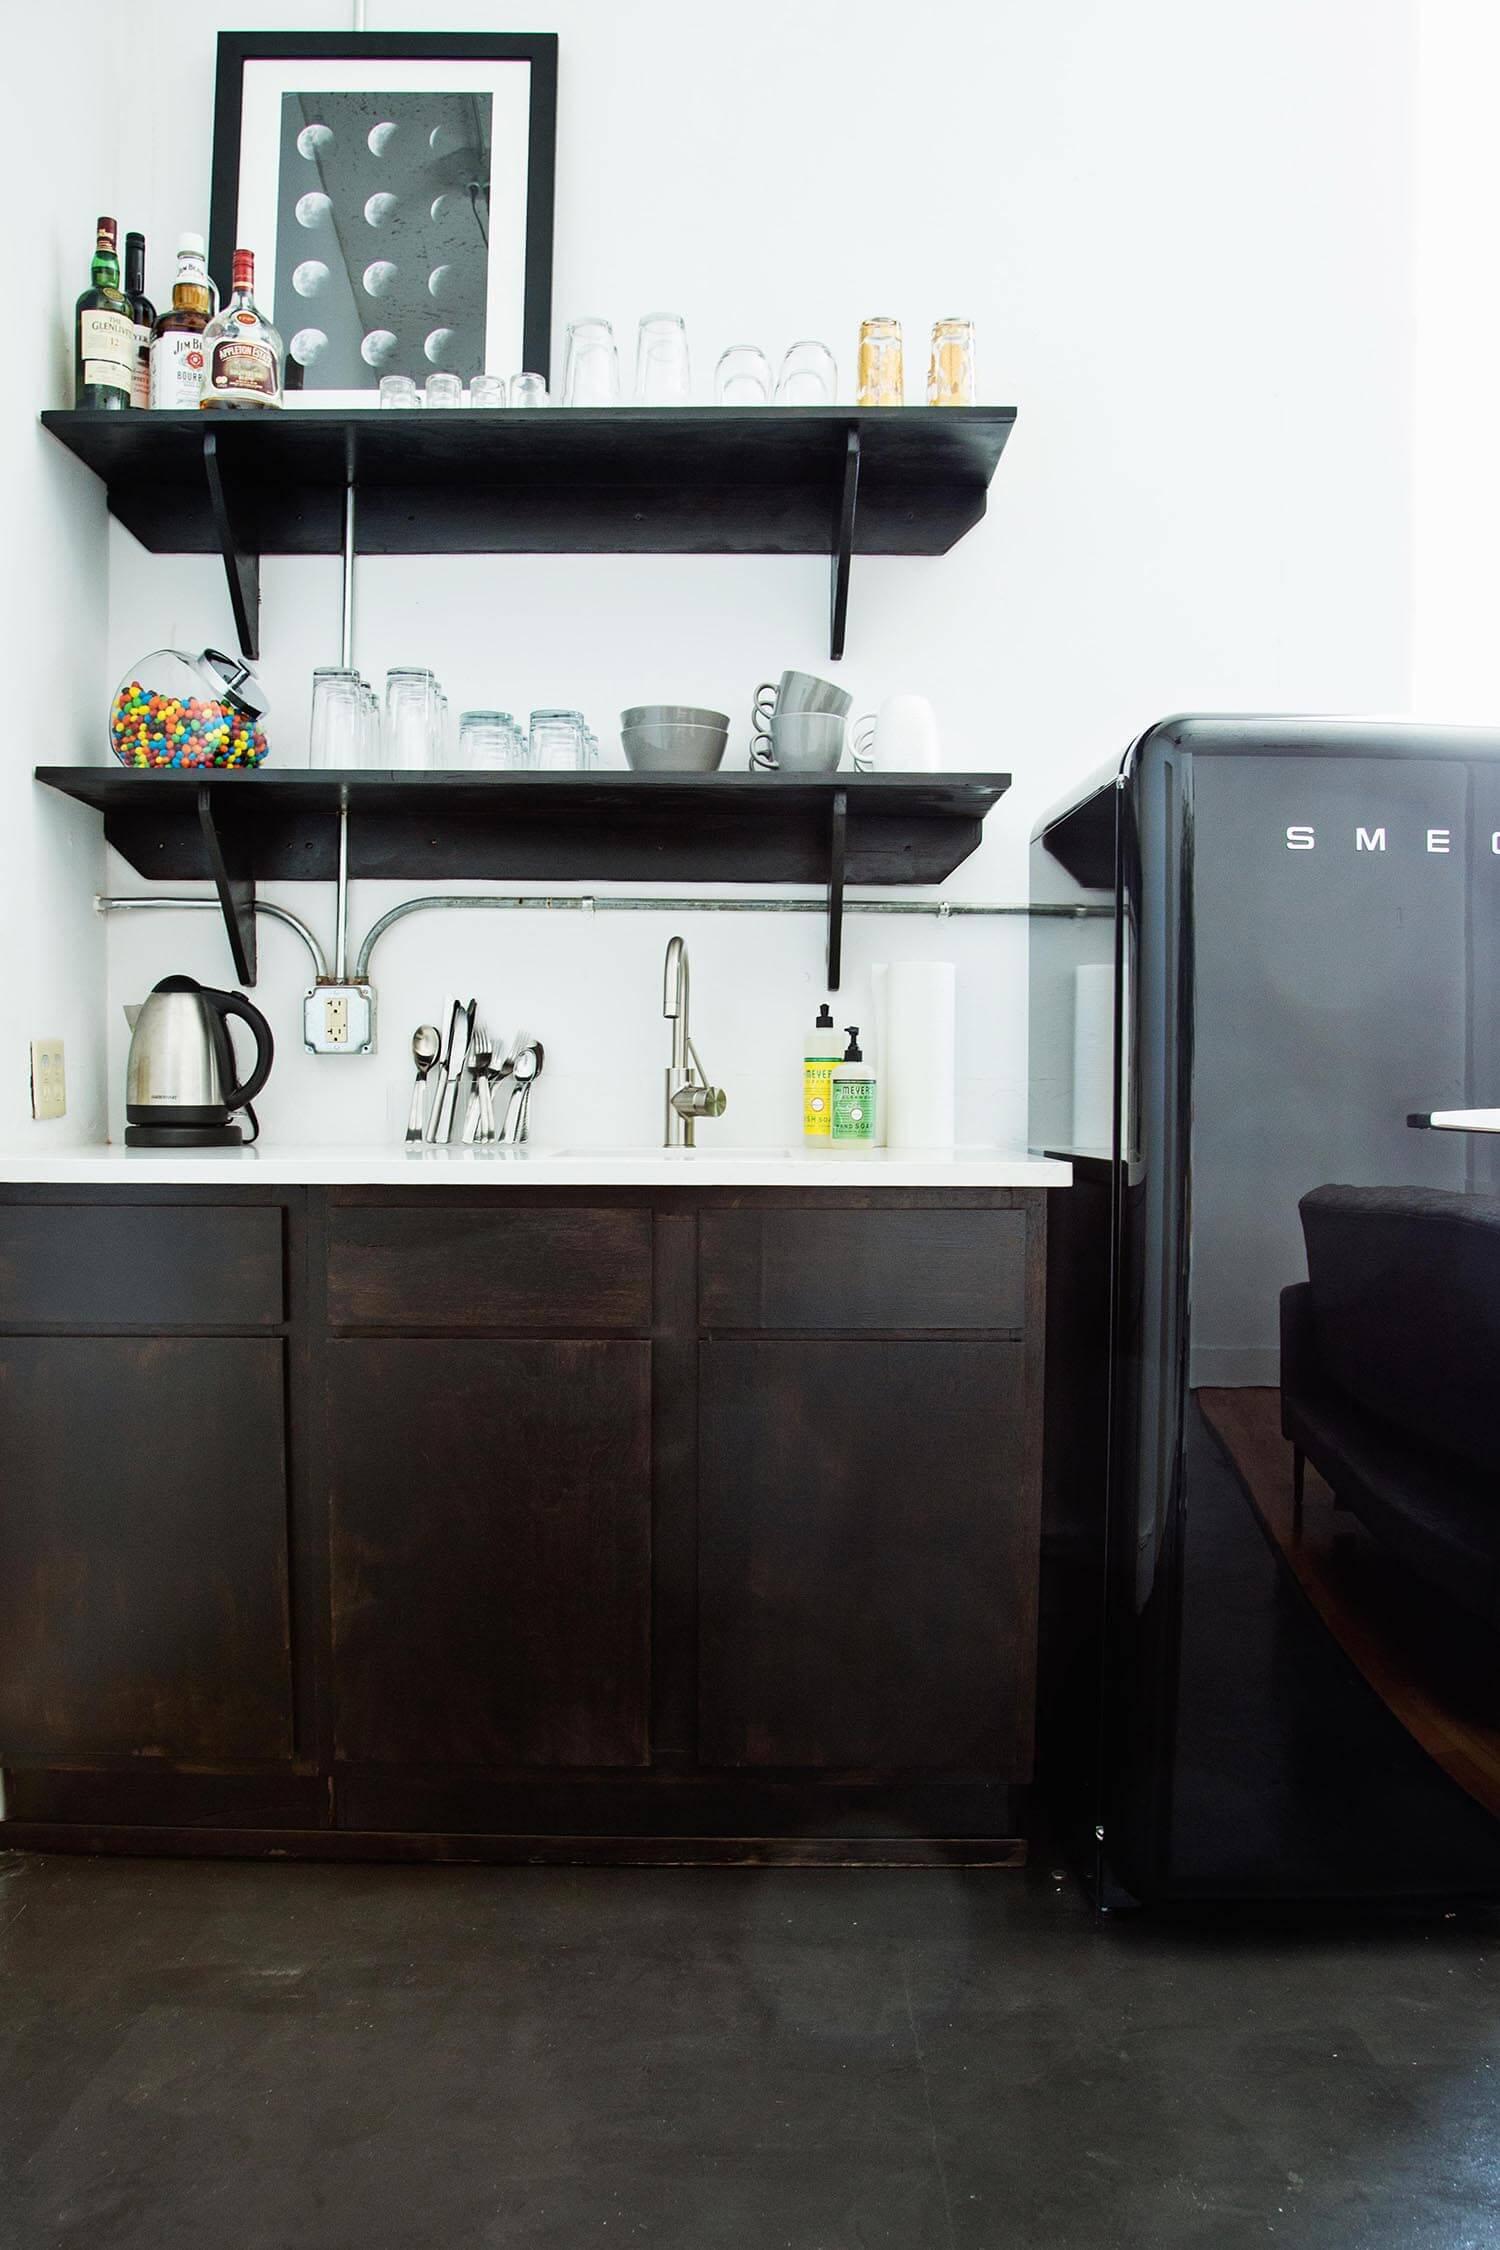 ABM breakroom area